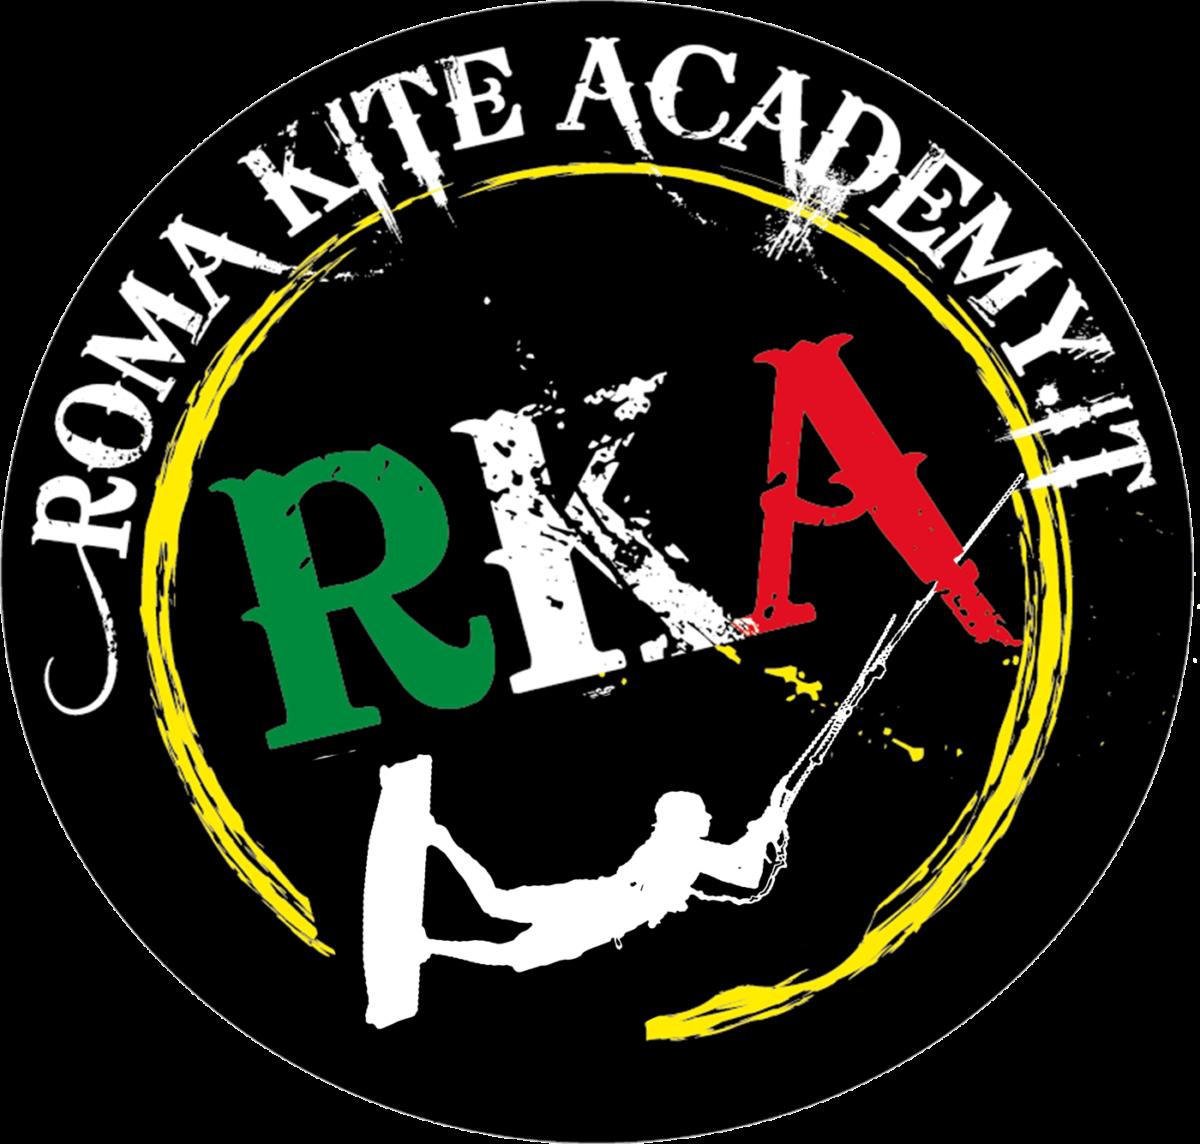 Roma Kite Academy (sede legale)